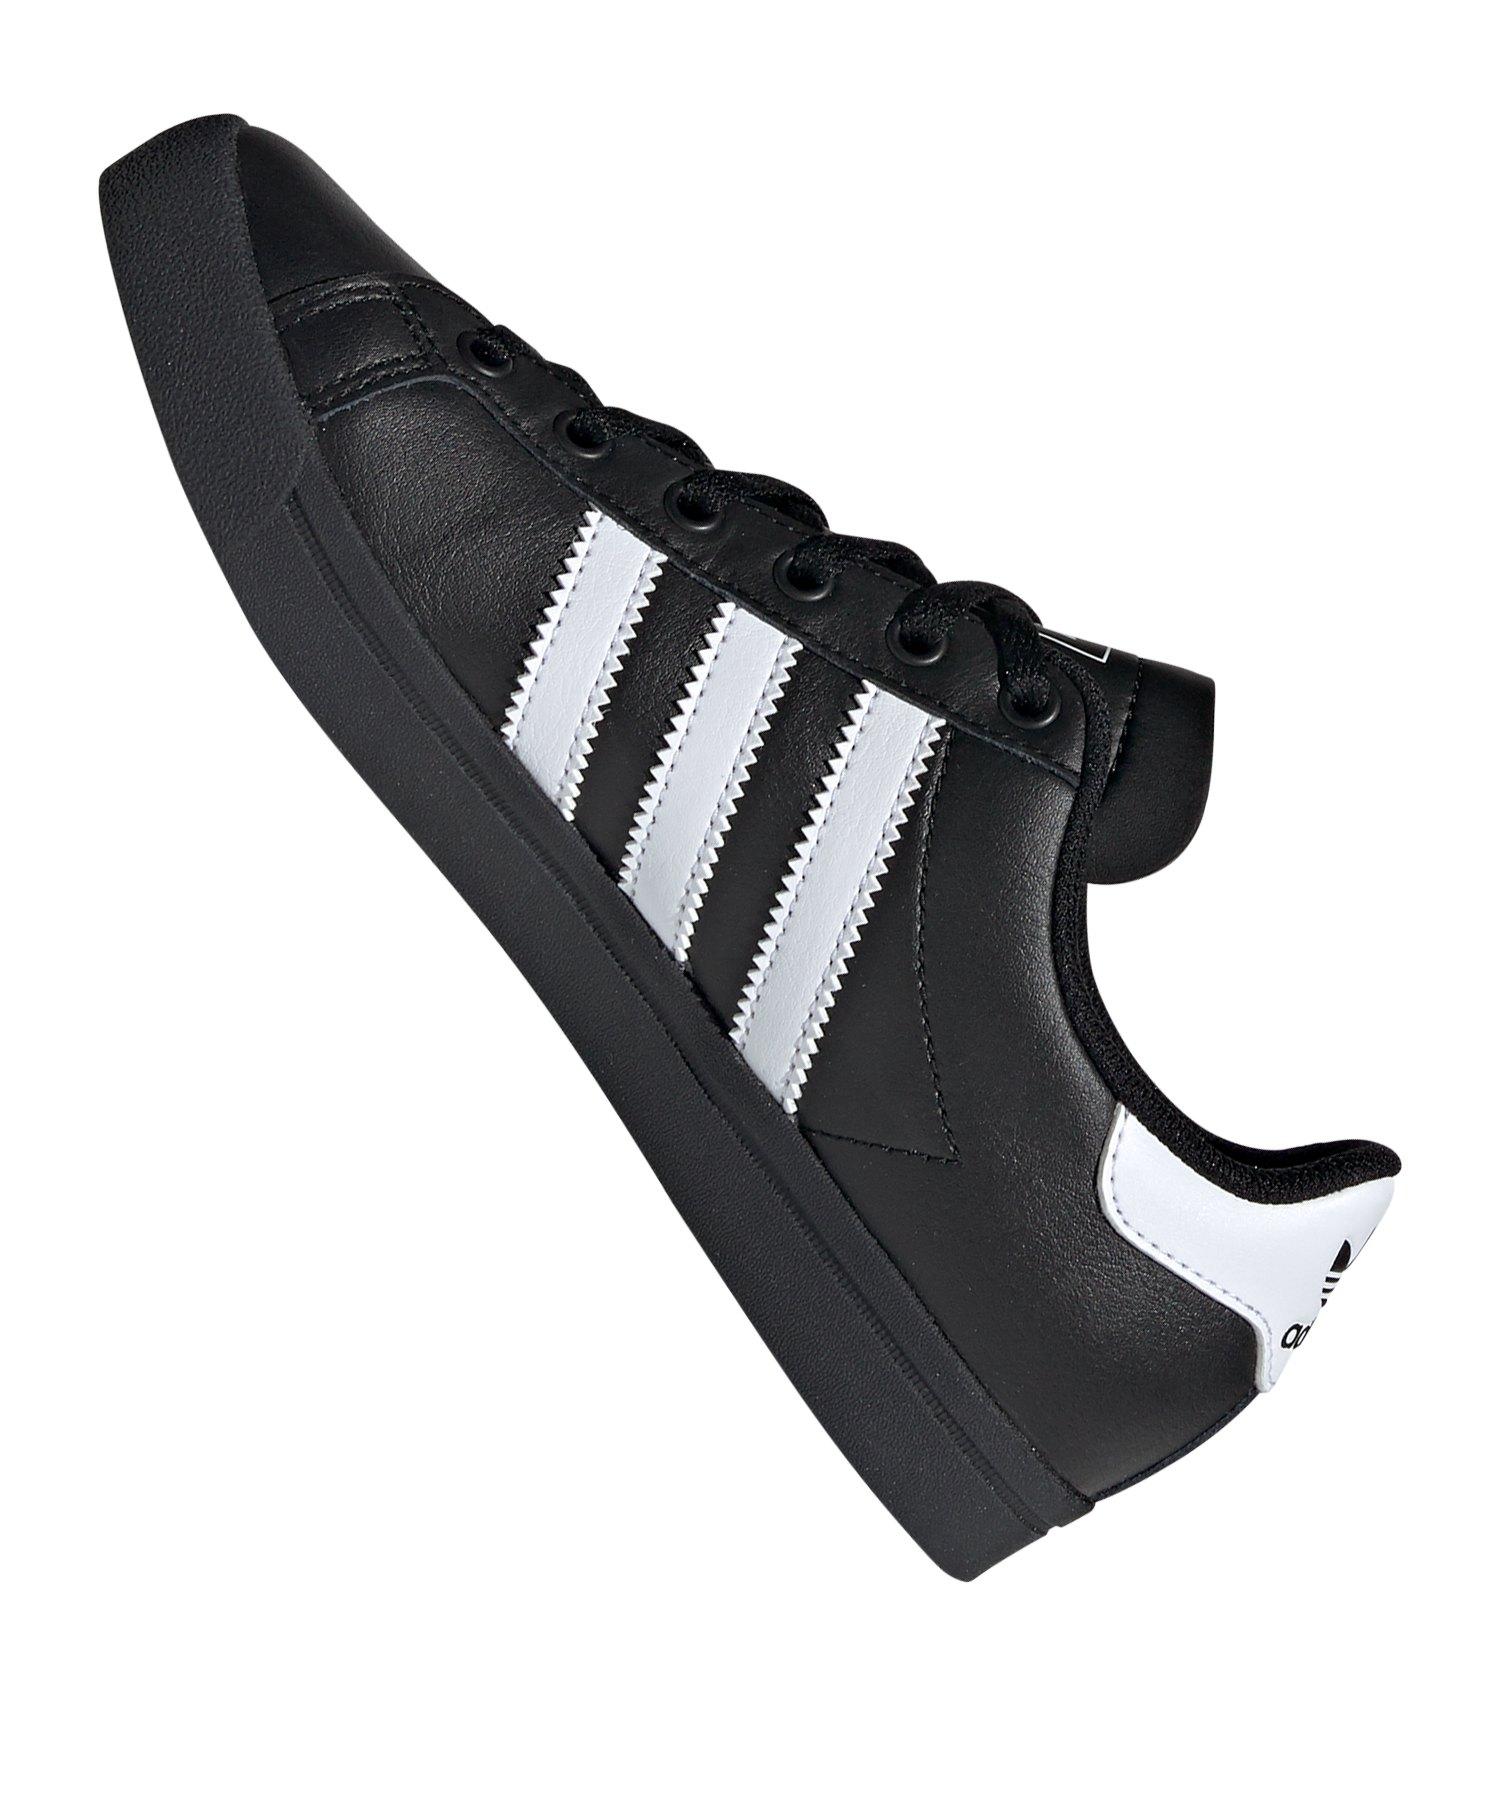 DEICHMANN SCHUHE adidas Kinder Sneaker RACER TR INF blau